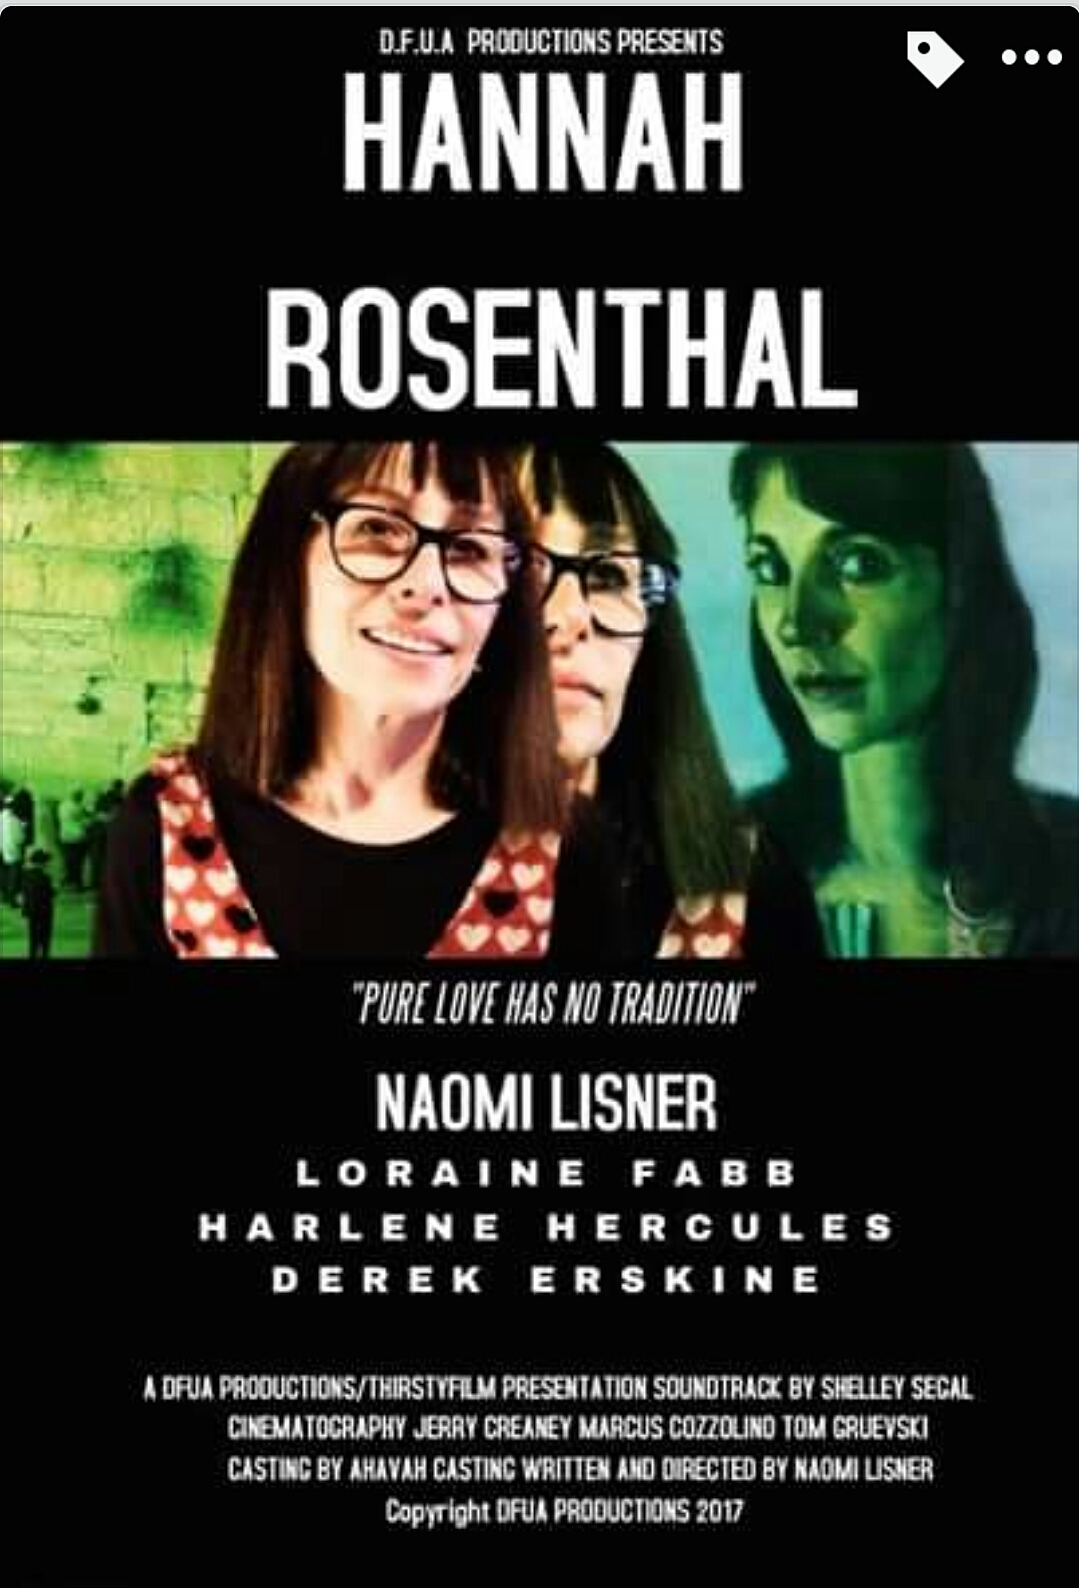 Aerfeldt painting in the short film 'Hannah Rosenthal' 2017